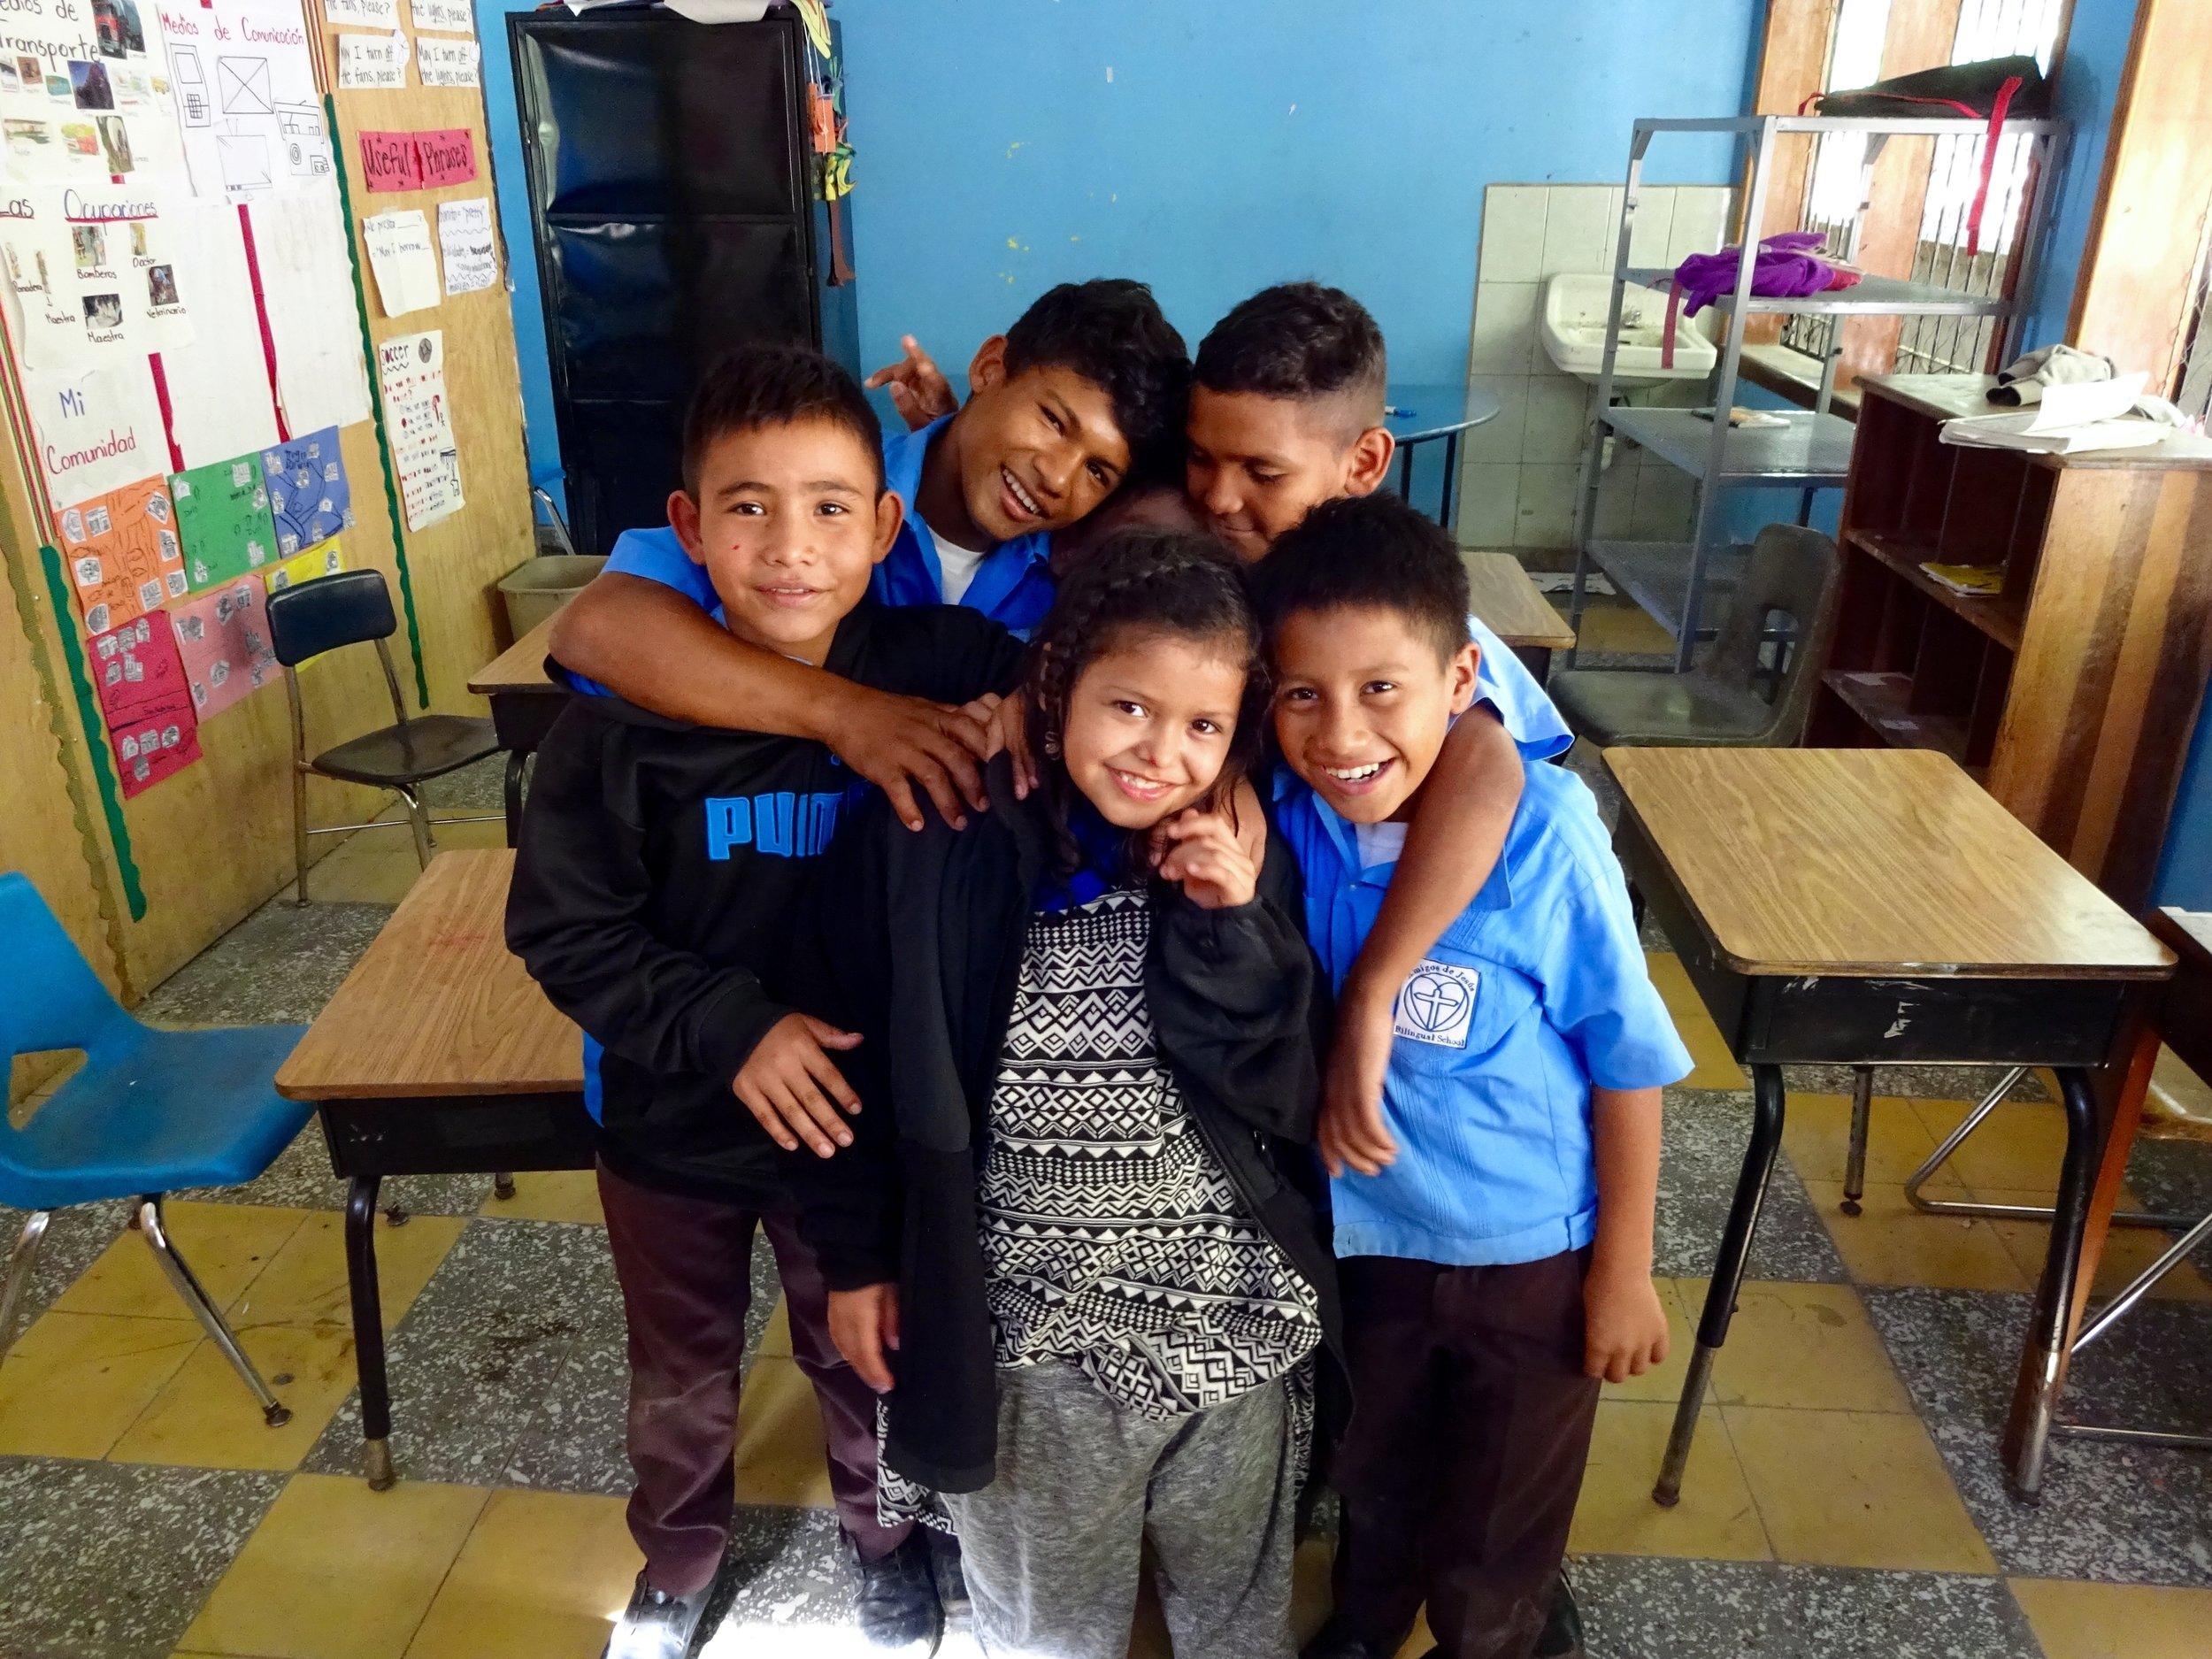 Natasha and her classmates